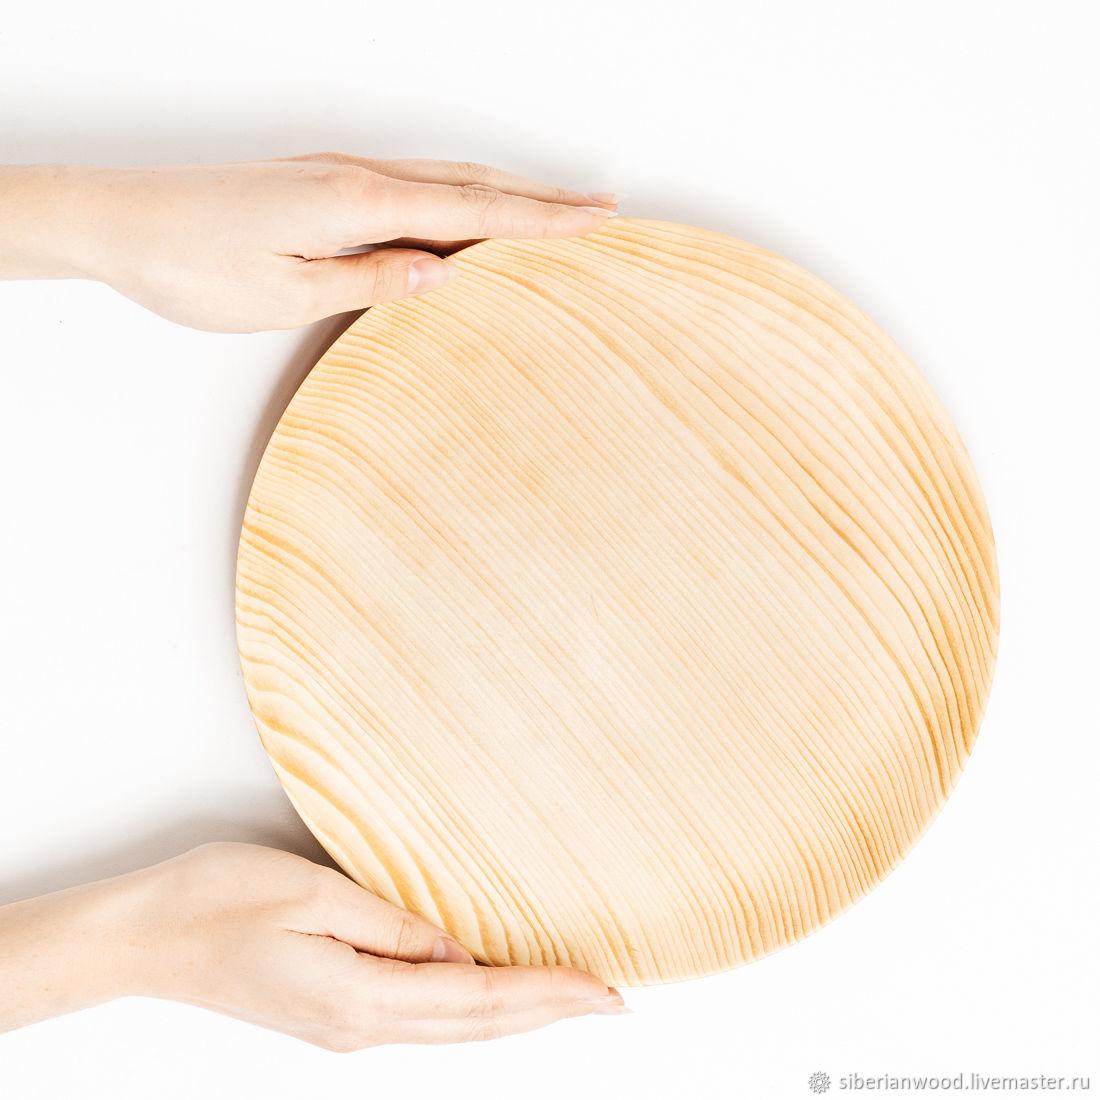 Wooden flat plate Siberian Cedar kitchen utensils #T106, Plates, Novokuznetsk,  Фото №1